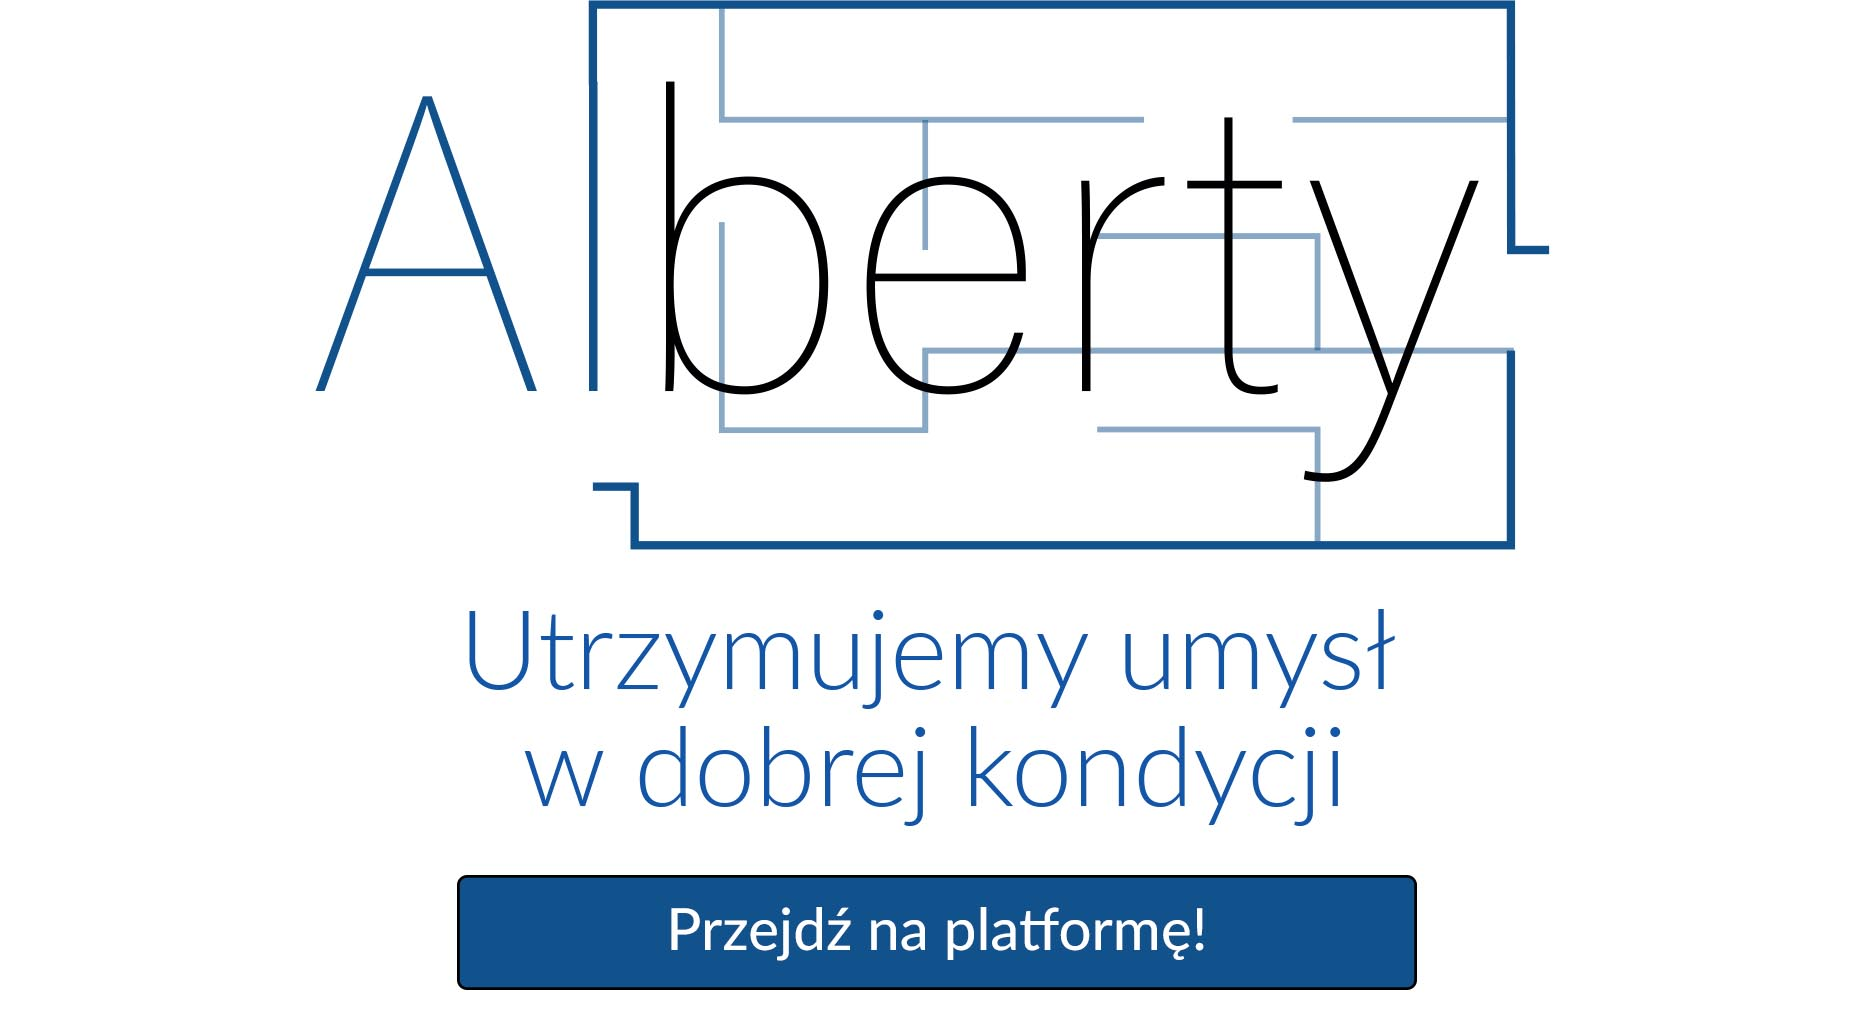 alberty